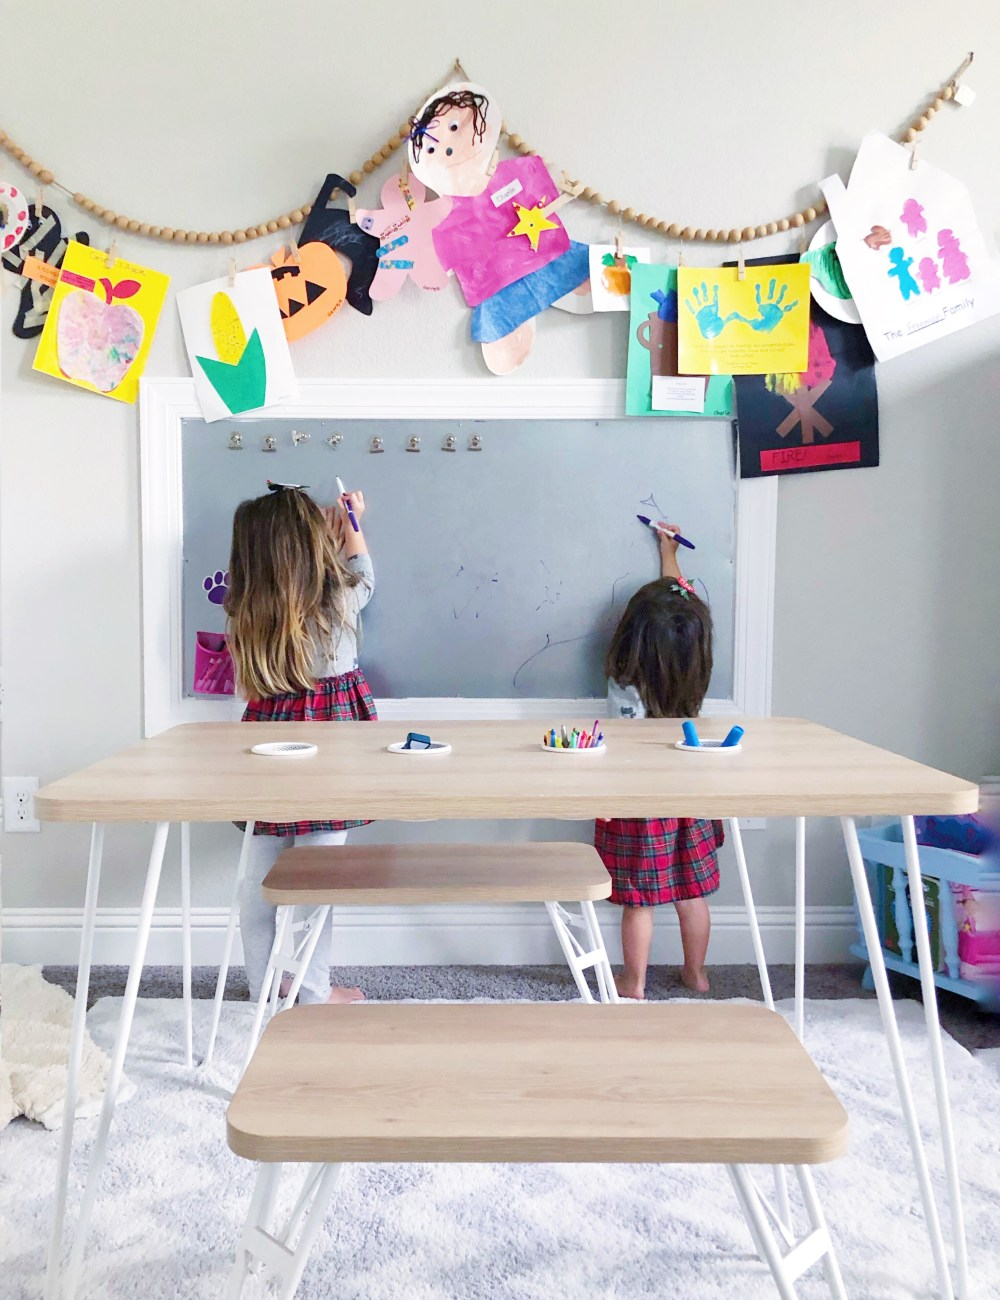 DIY Galvanized Sheet Dry Erase Board